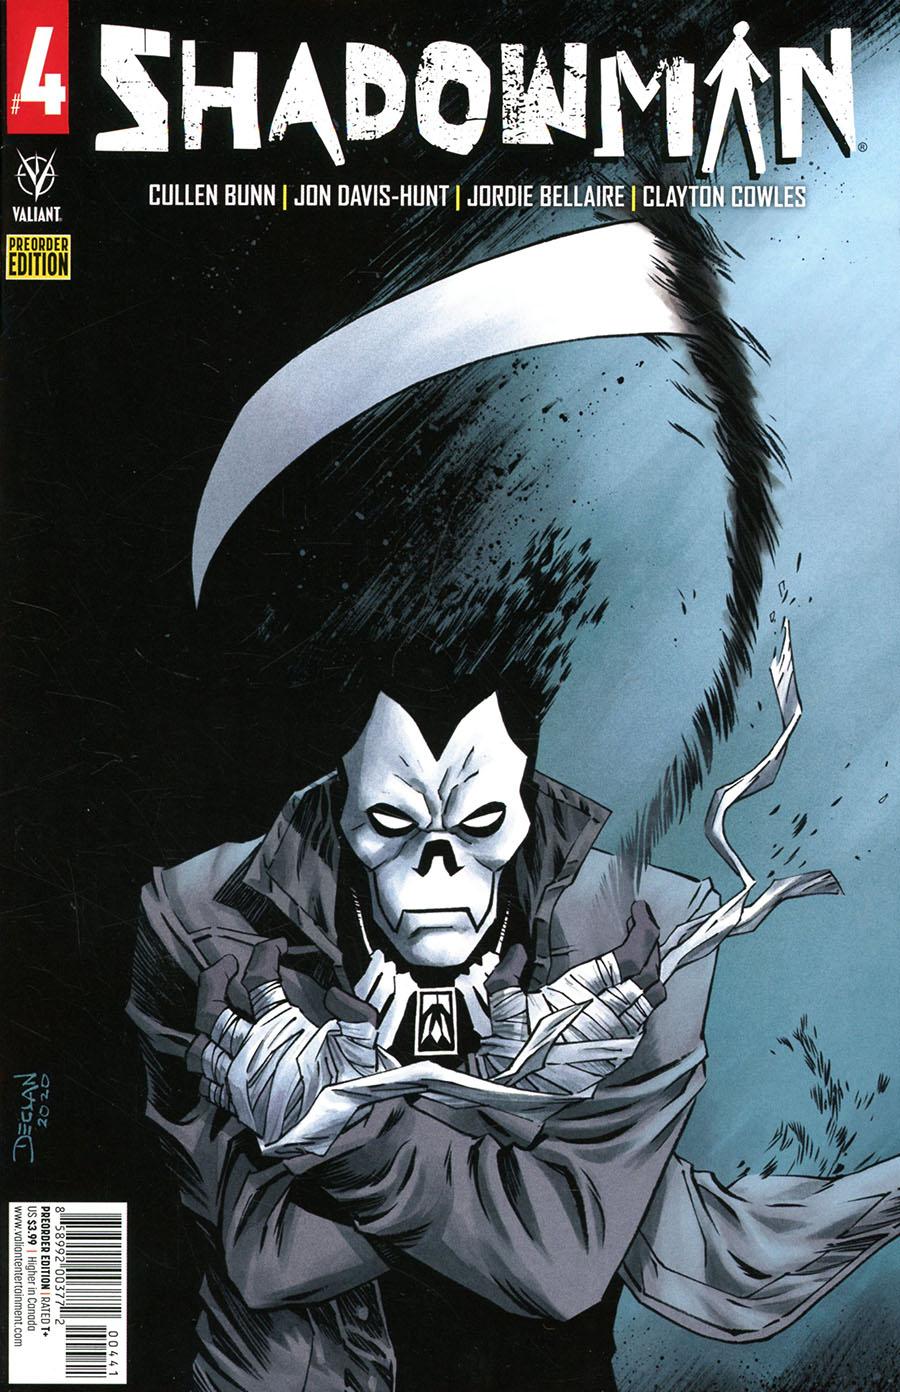 Shadowman Vol 6 #4 Cover D Variant Declan Shalvey Pre-Order Edition